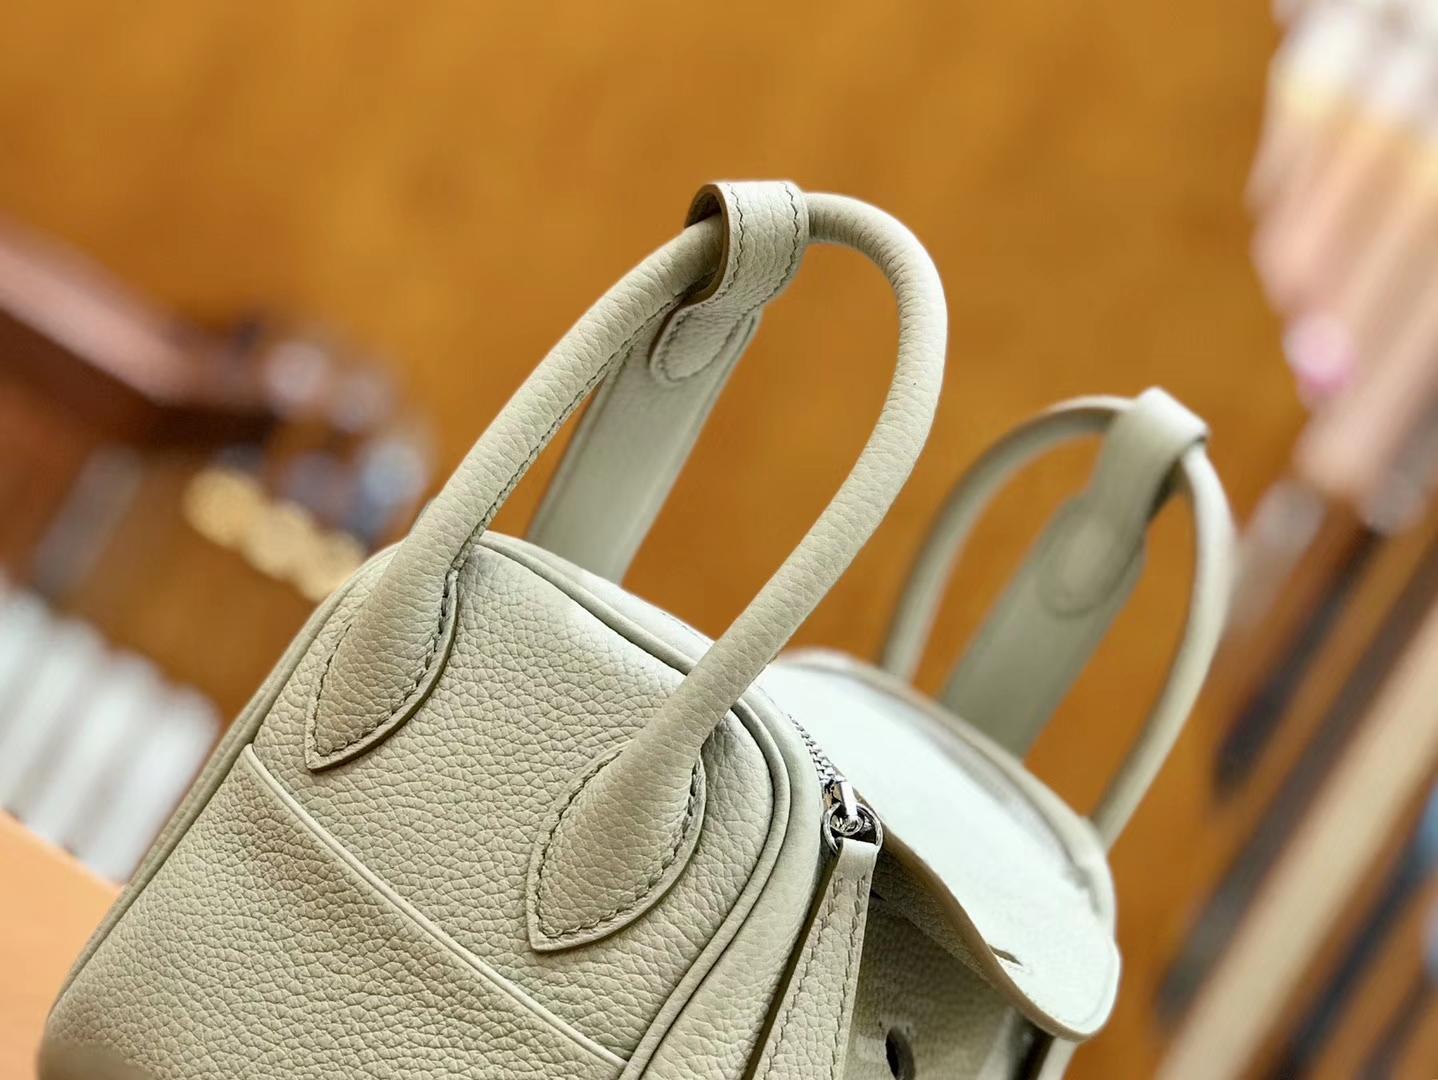 Hermès(爱马仕)Lindy 18cm 珍珠灰 银扣 小牛皮 全手工缝制